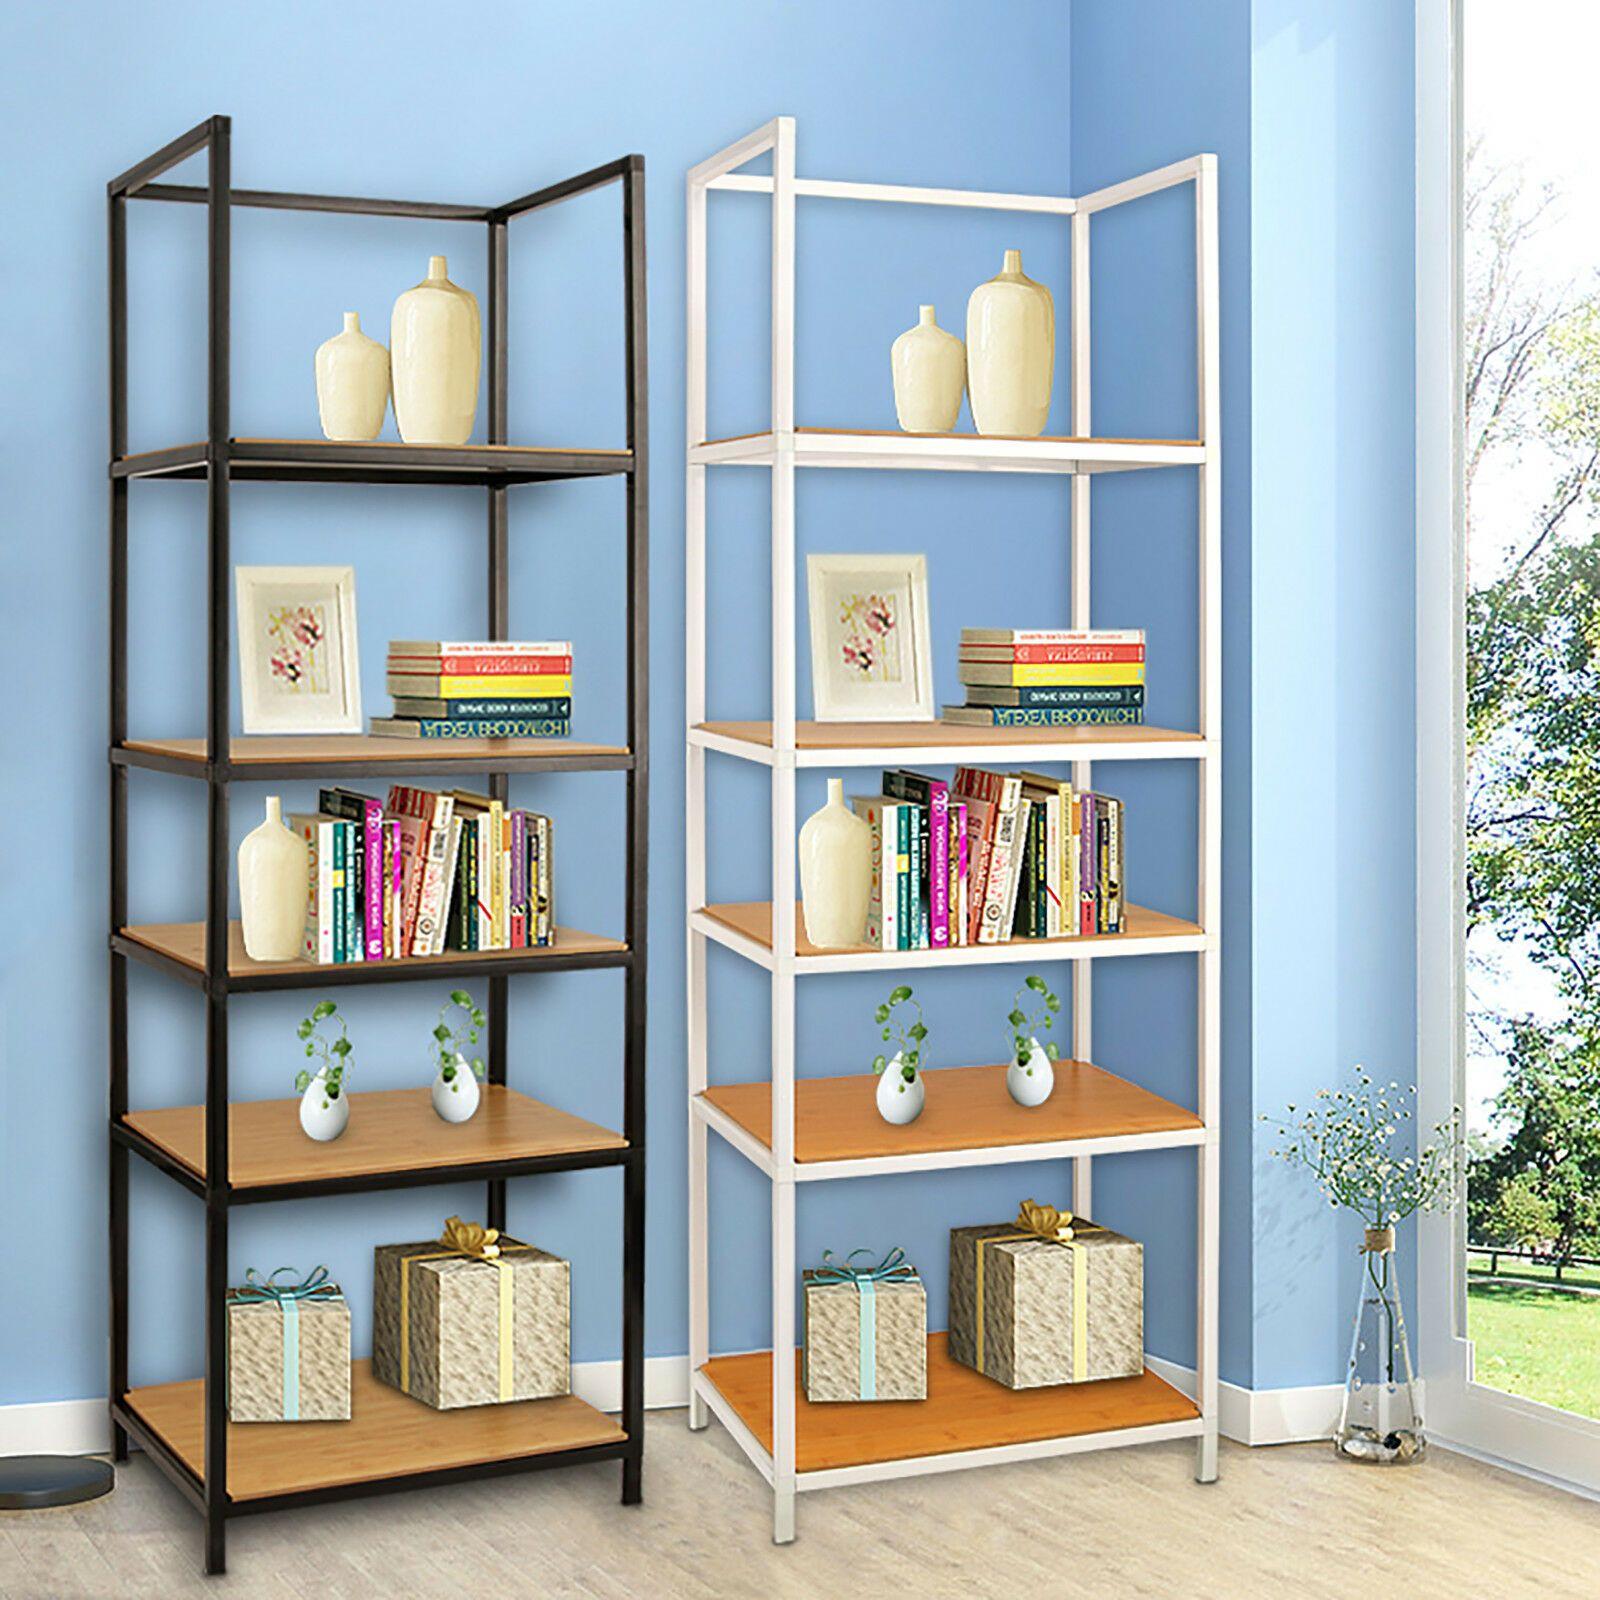 5 Tier Shelf Unit Home Office Lounge